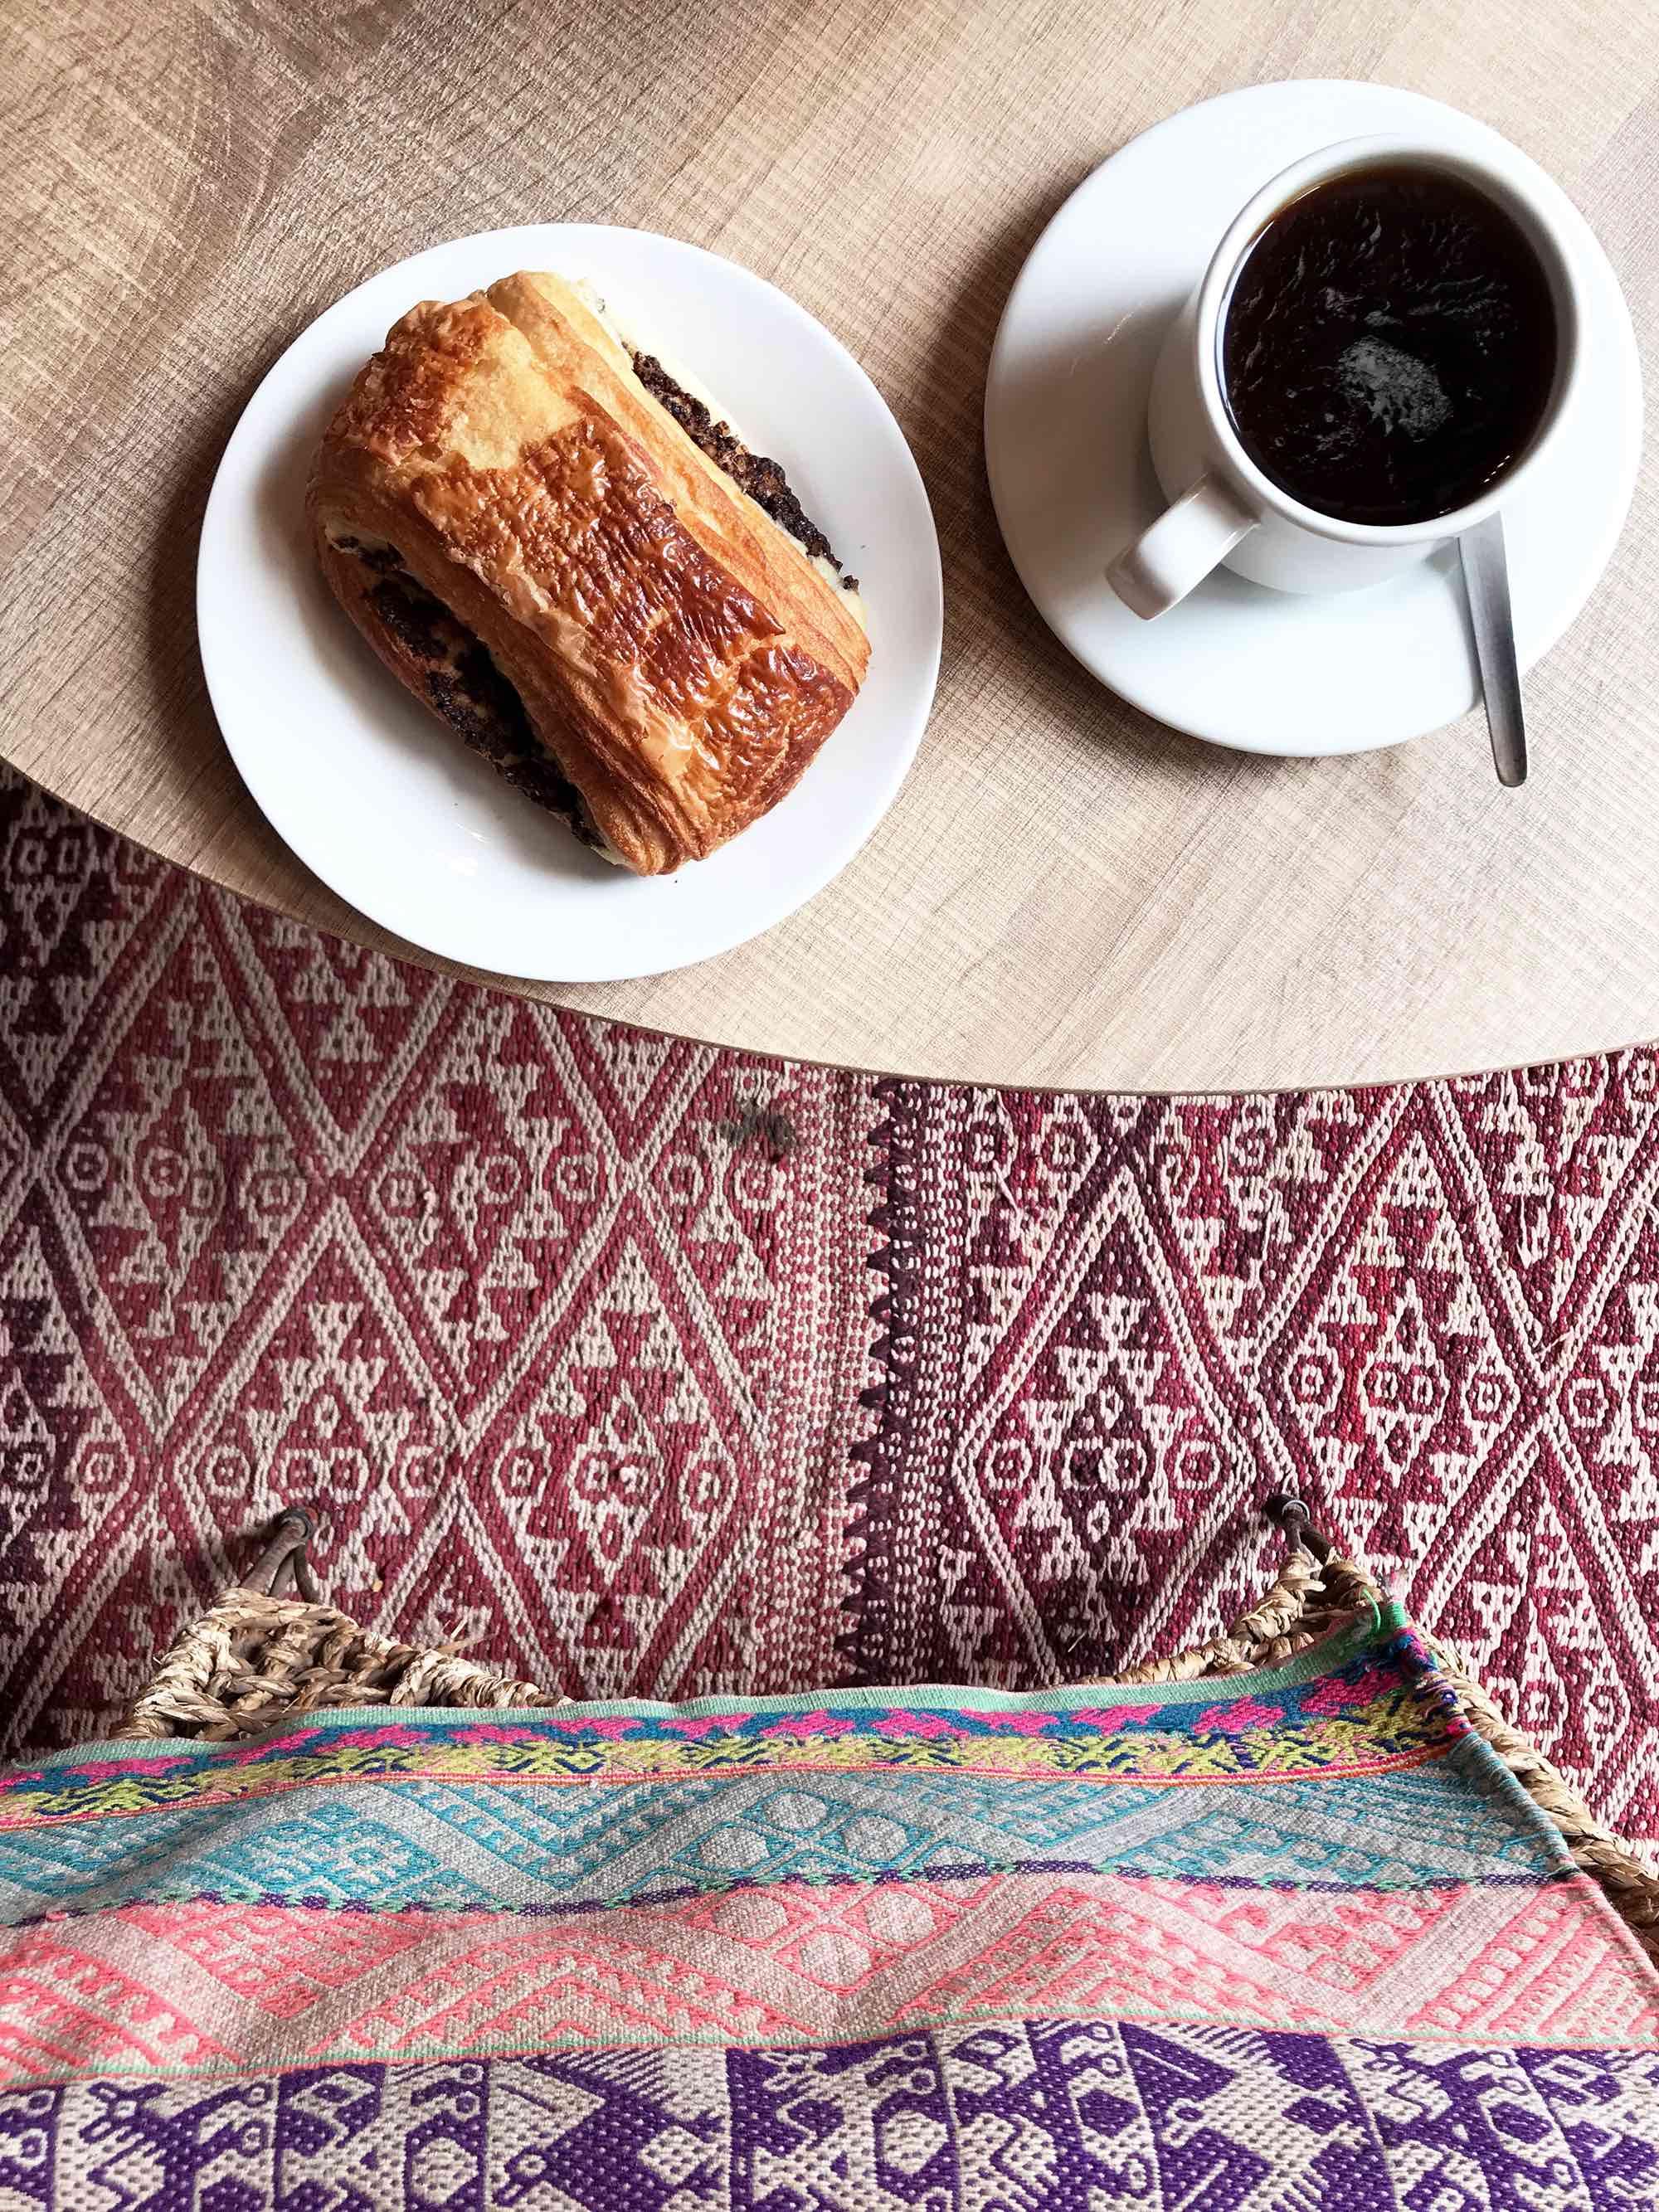 pastry at Cocoliso coffee shop in Cusco, Peru